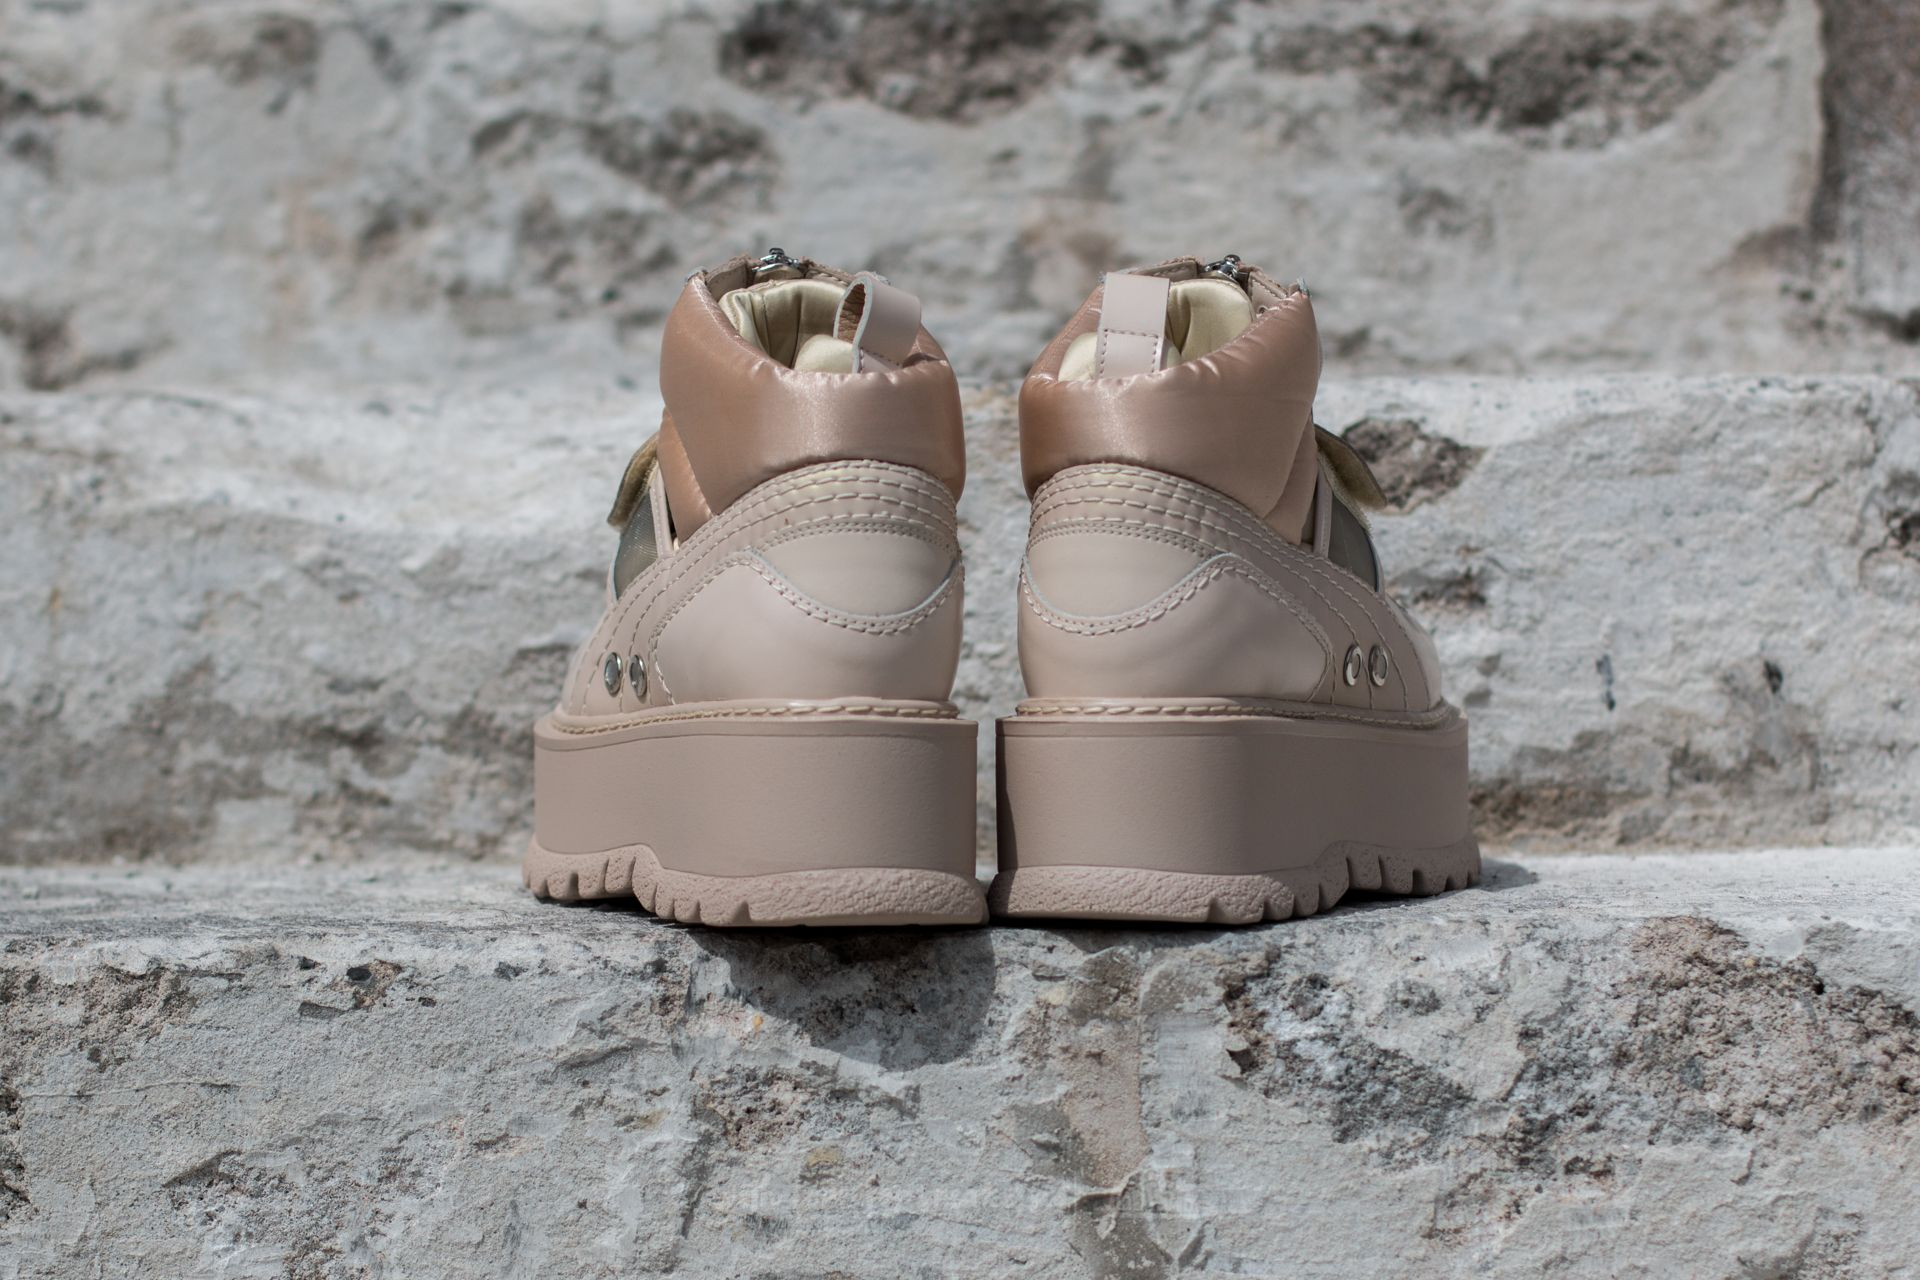 Puma FENTY Sneaker Boot Strap Wns Pink Tint Pink Tint Tint | Footshop